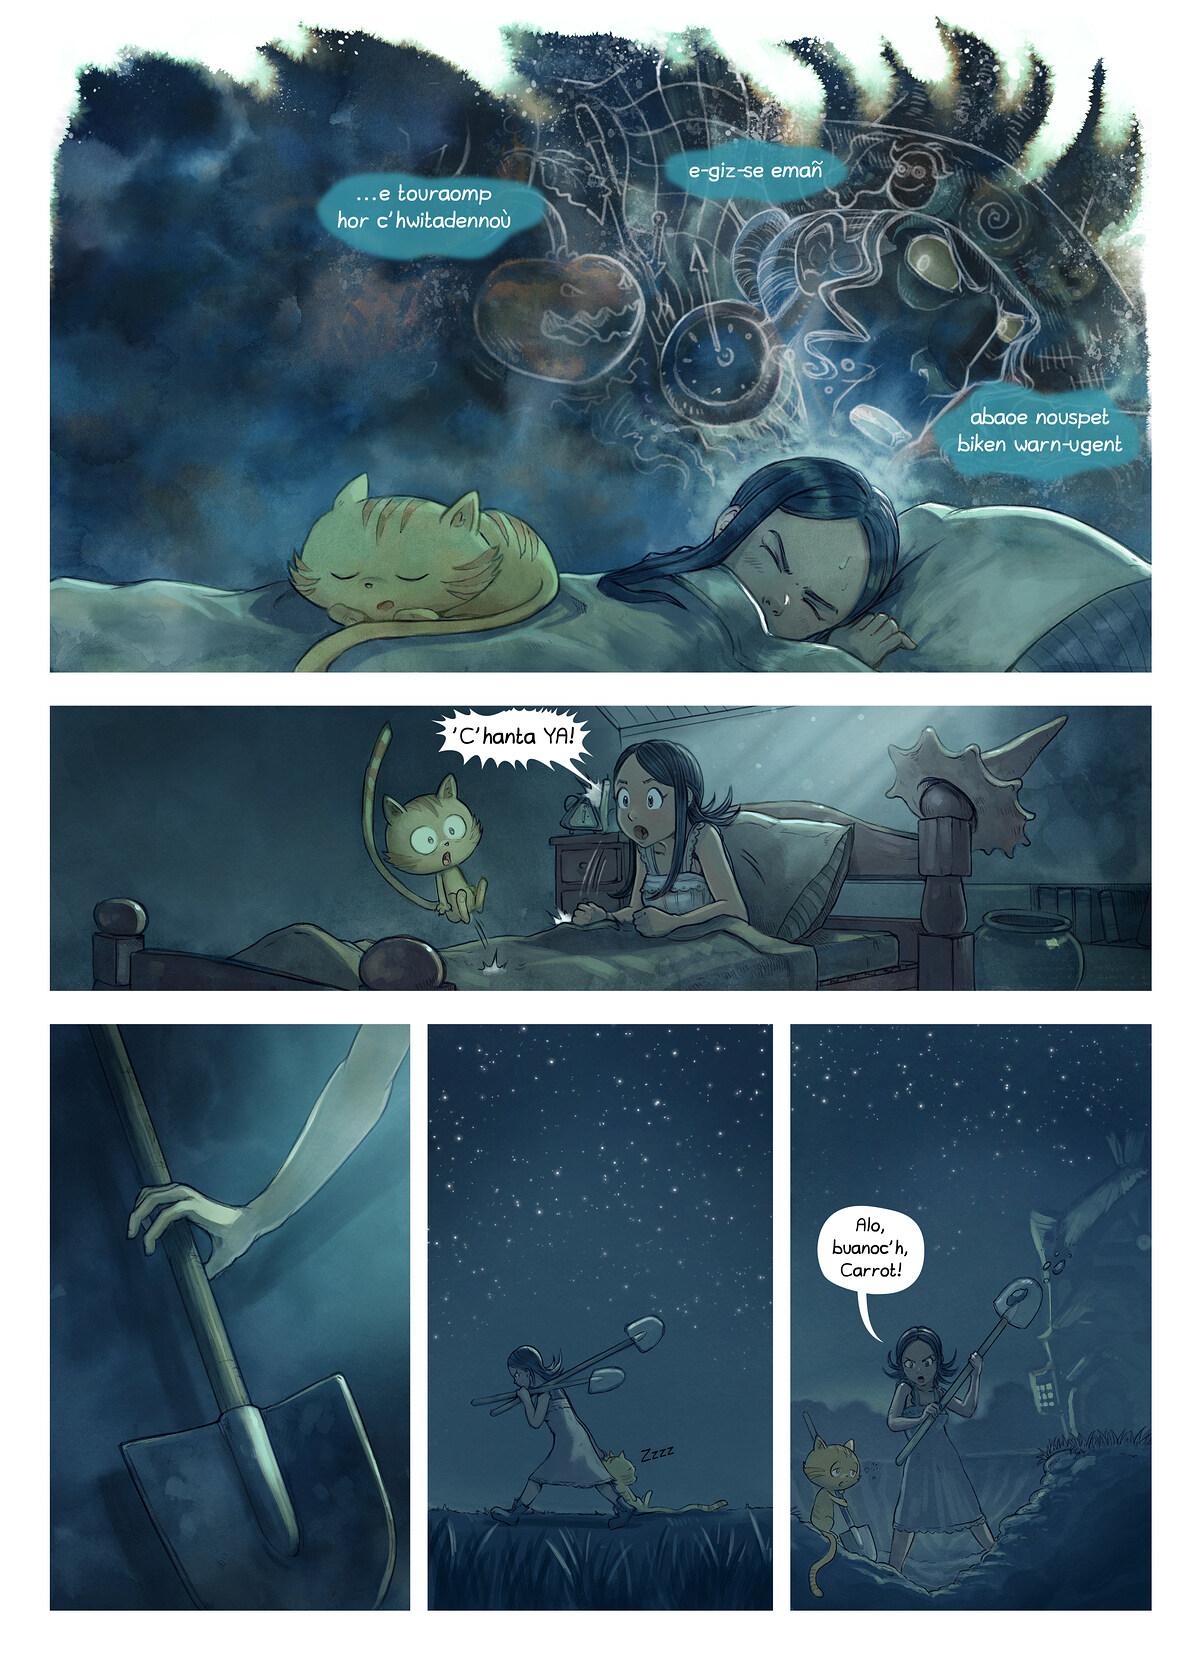 A webcomic page of Pepper&Carrot, rann 19 [br], pajenn 3